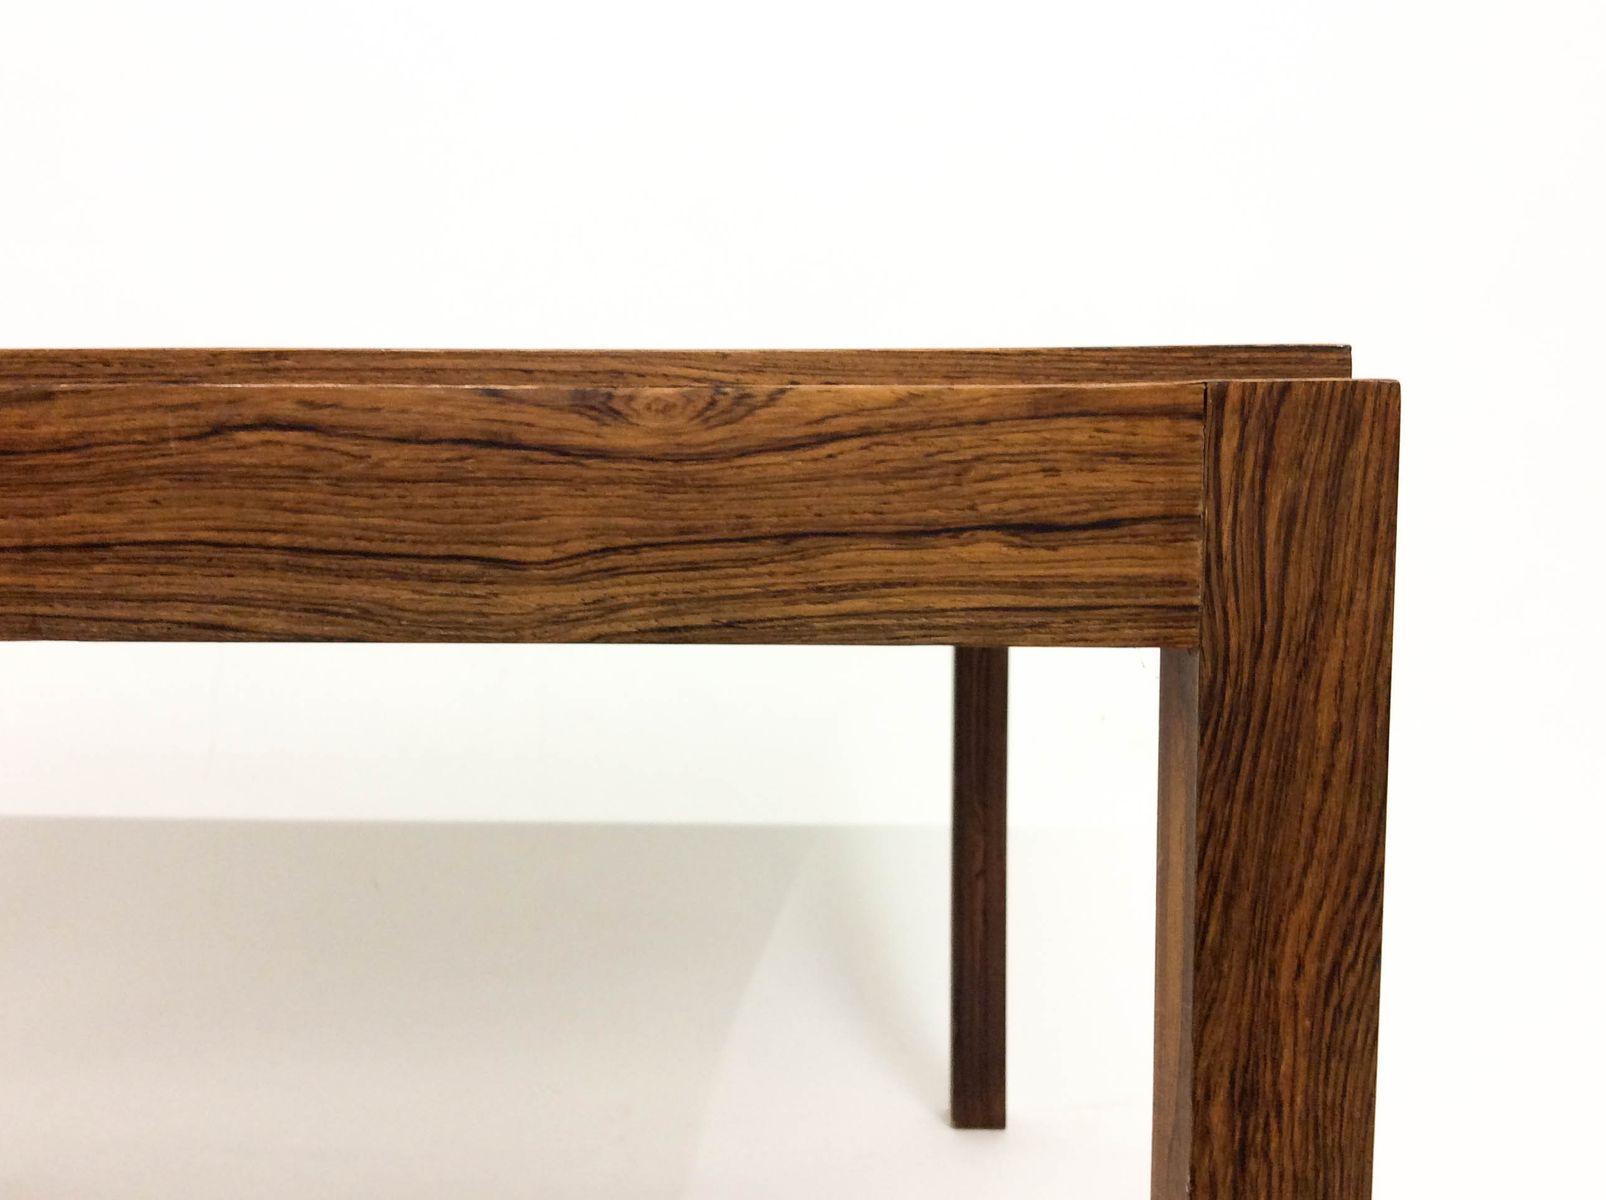 Danish Rosewood Coffee Table, 1960s 6. $1,279.00. +$399.00 ...